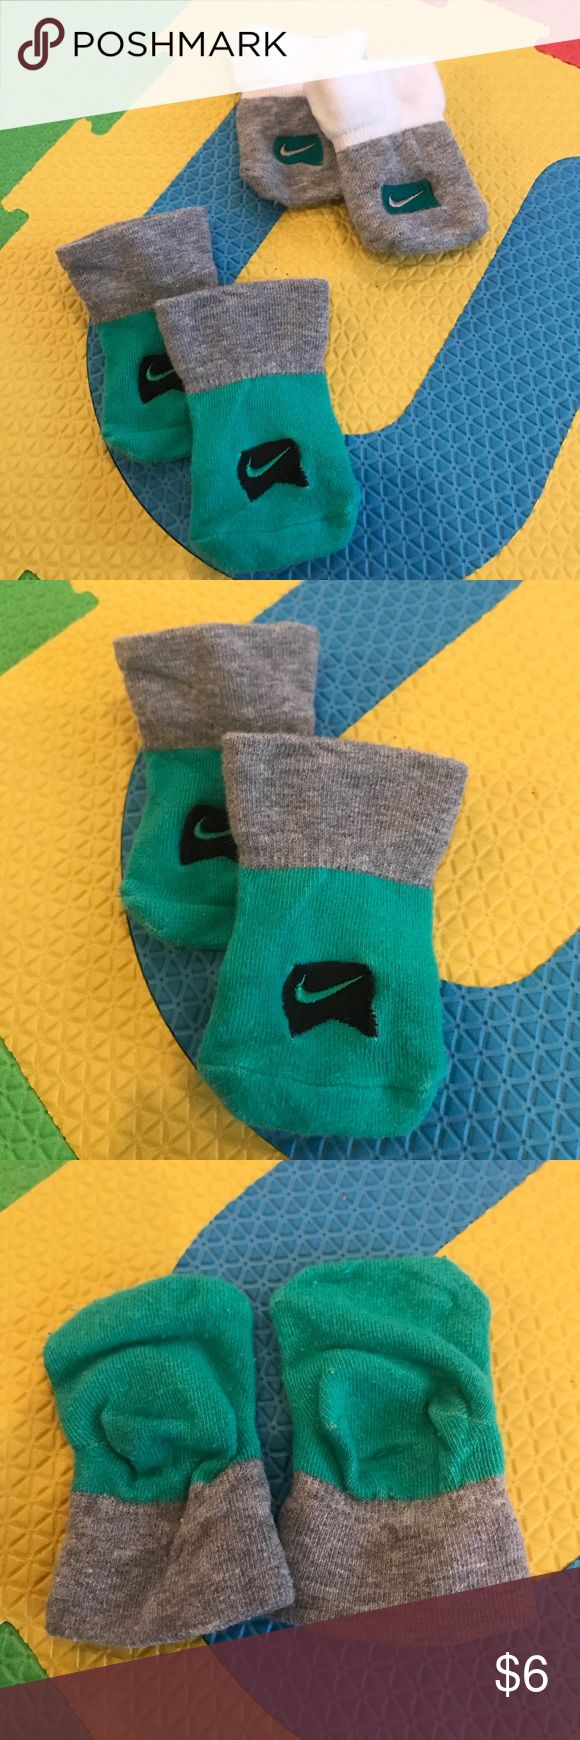 Baby NIKE Socks. Sz. 0-6 MTHS. Used good condition Baby NIKE Socks. Sz. 0-6 MTHS. Used good condition Nike Other